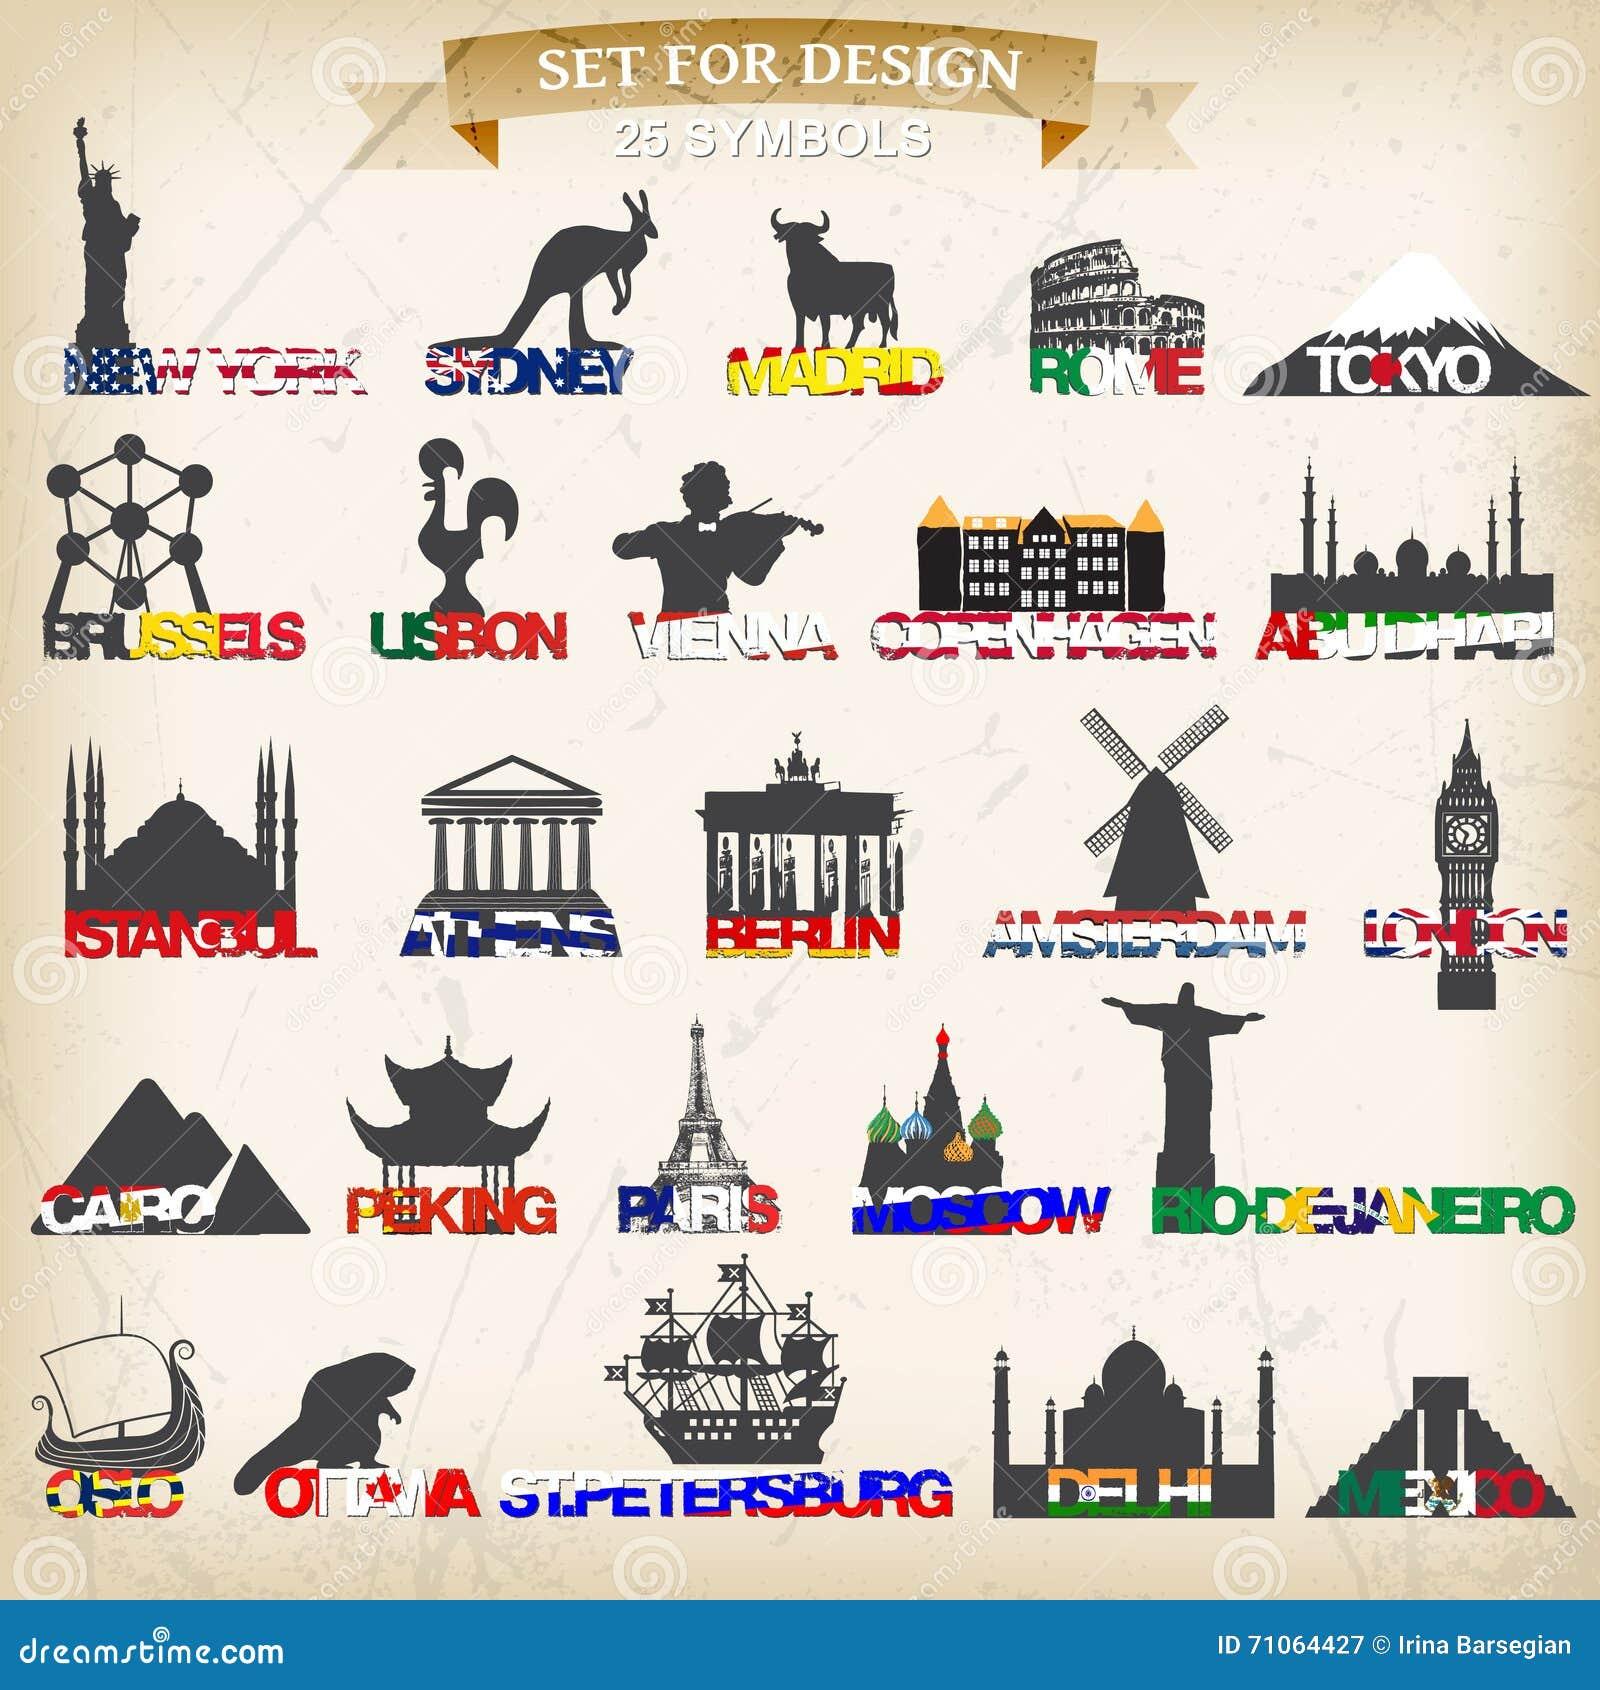 Set of tourist symbolsctor illustration stock vector set of tourist symbolsctor illustration biocorpaavc Images